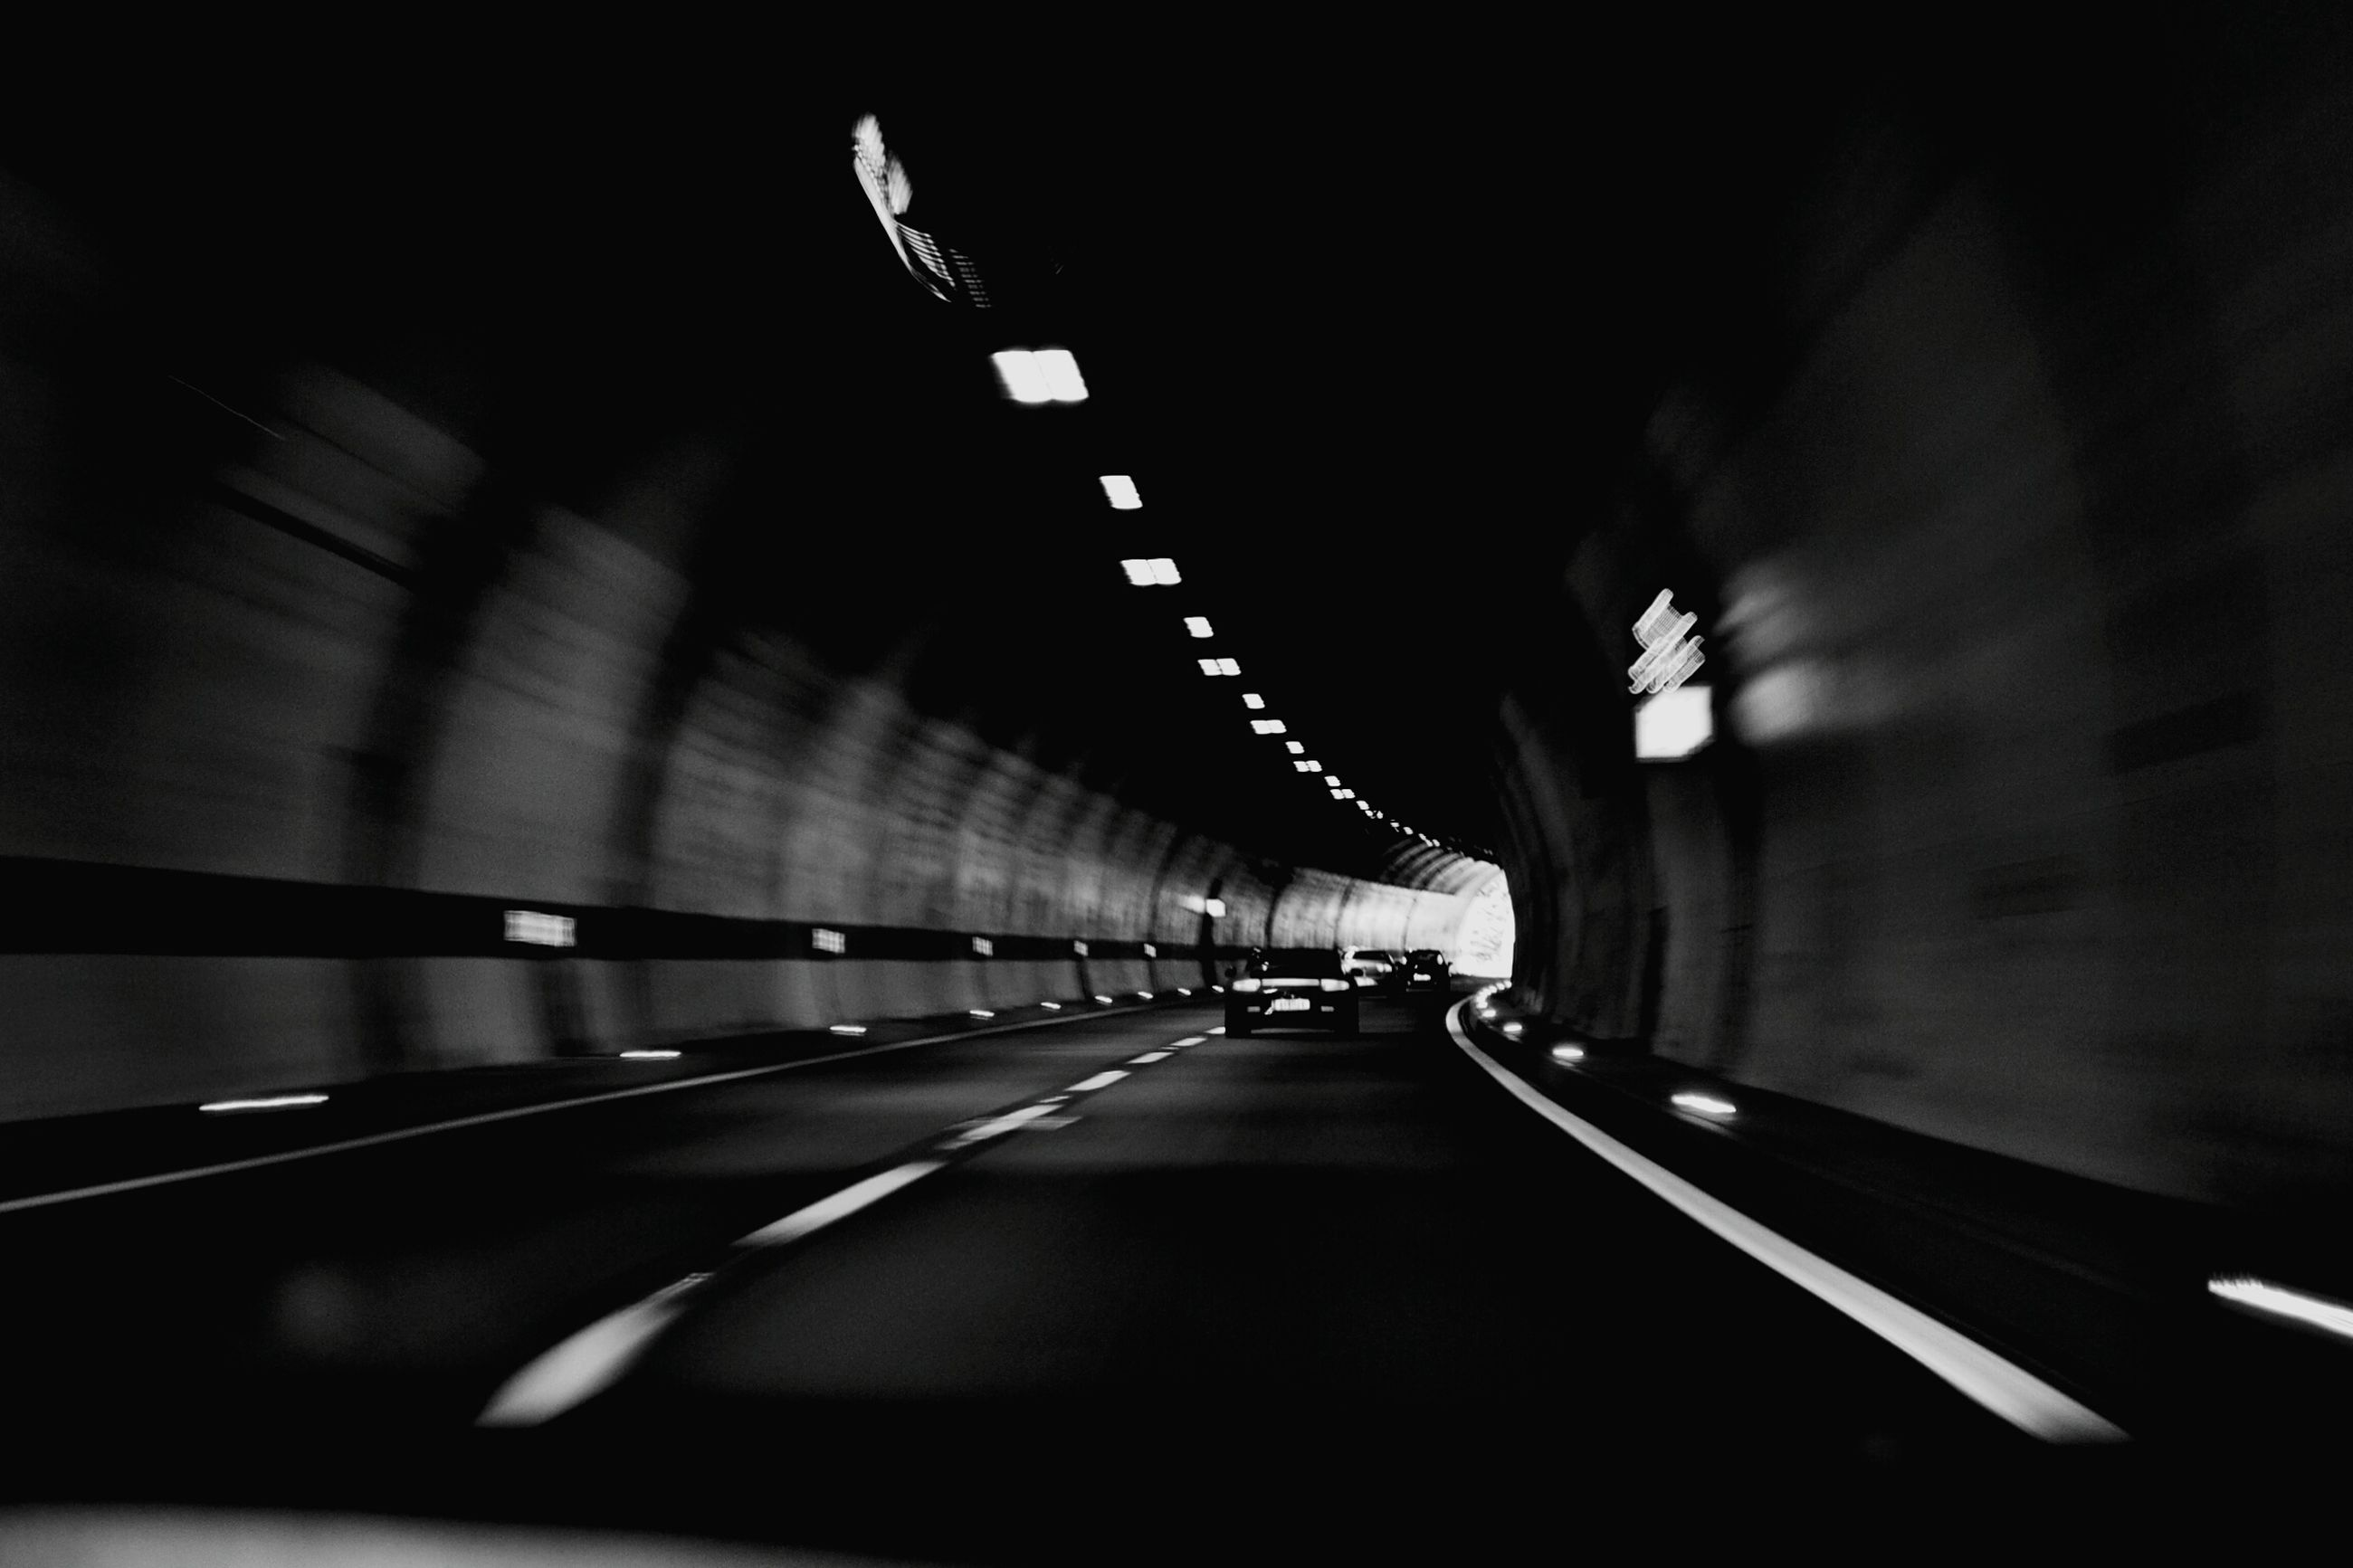 transportation, the way forward, illuminated, diminishing perspective, tunnel, vanishing point, road marking, road, indoors, mode of transport, night, on the move, blurred motion, travel, motion, empty, lighting equipment, land vehicle, underground, long